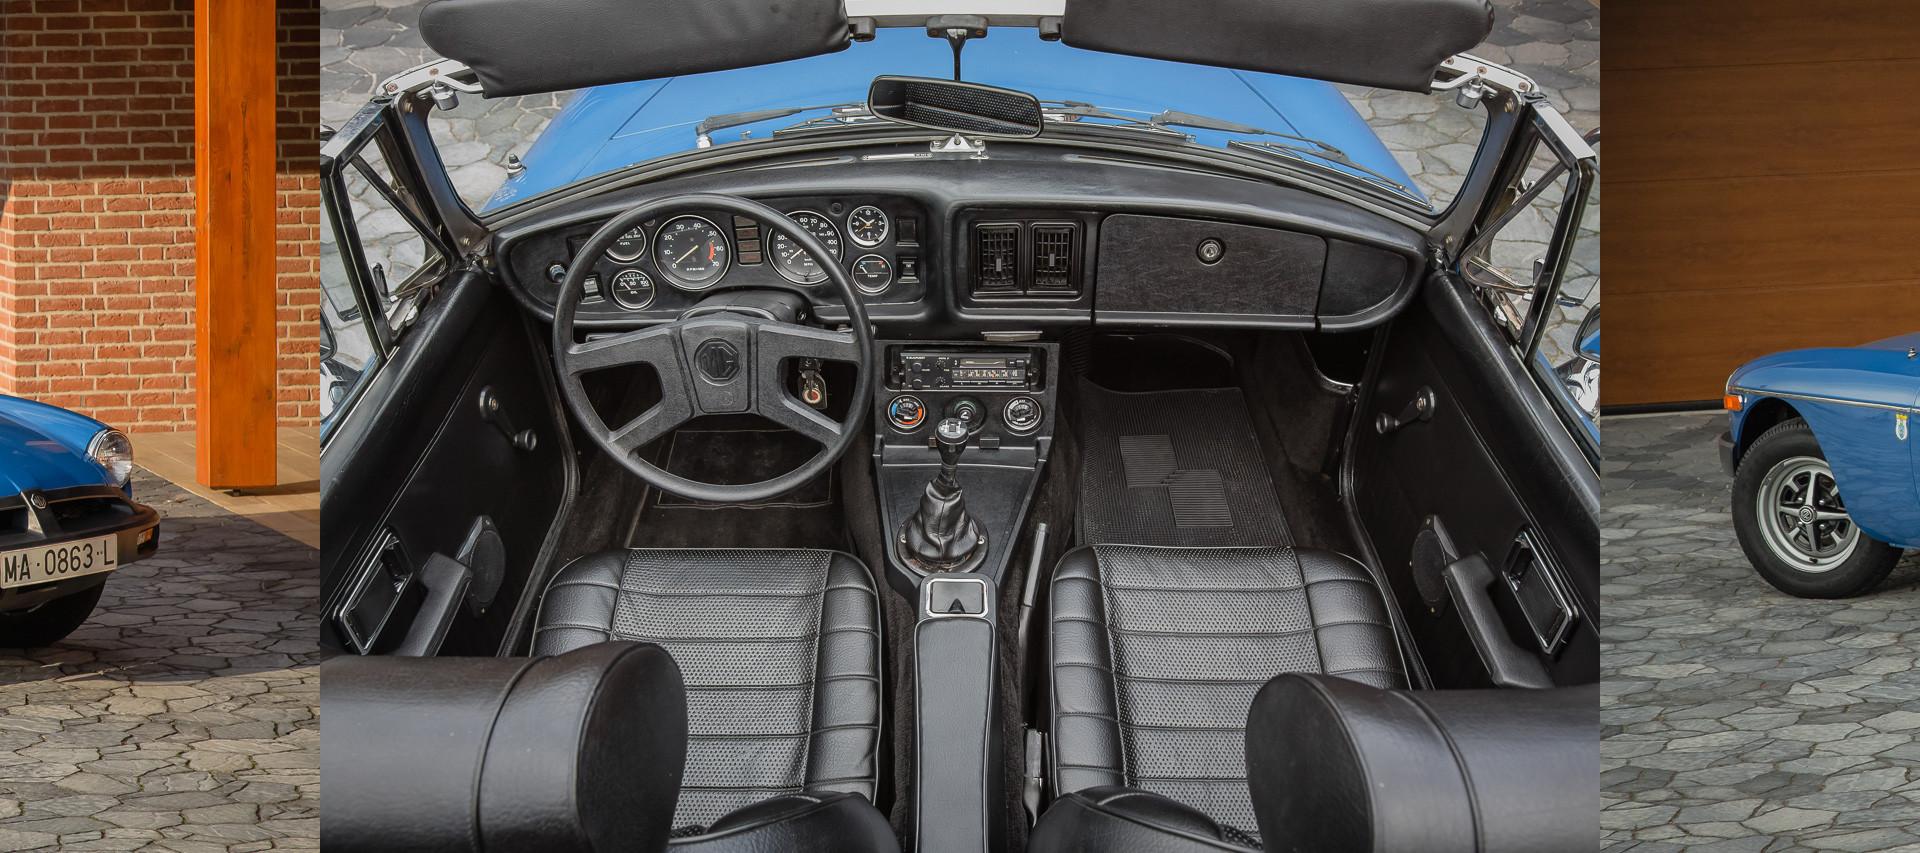 MG1800 Roadster